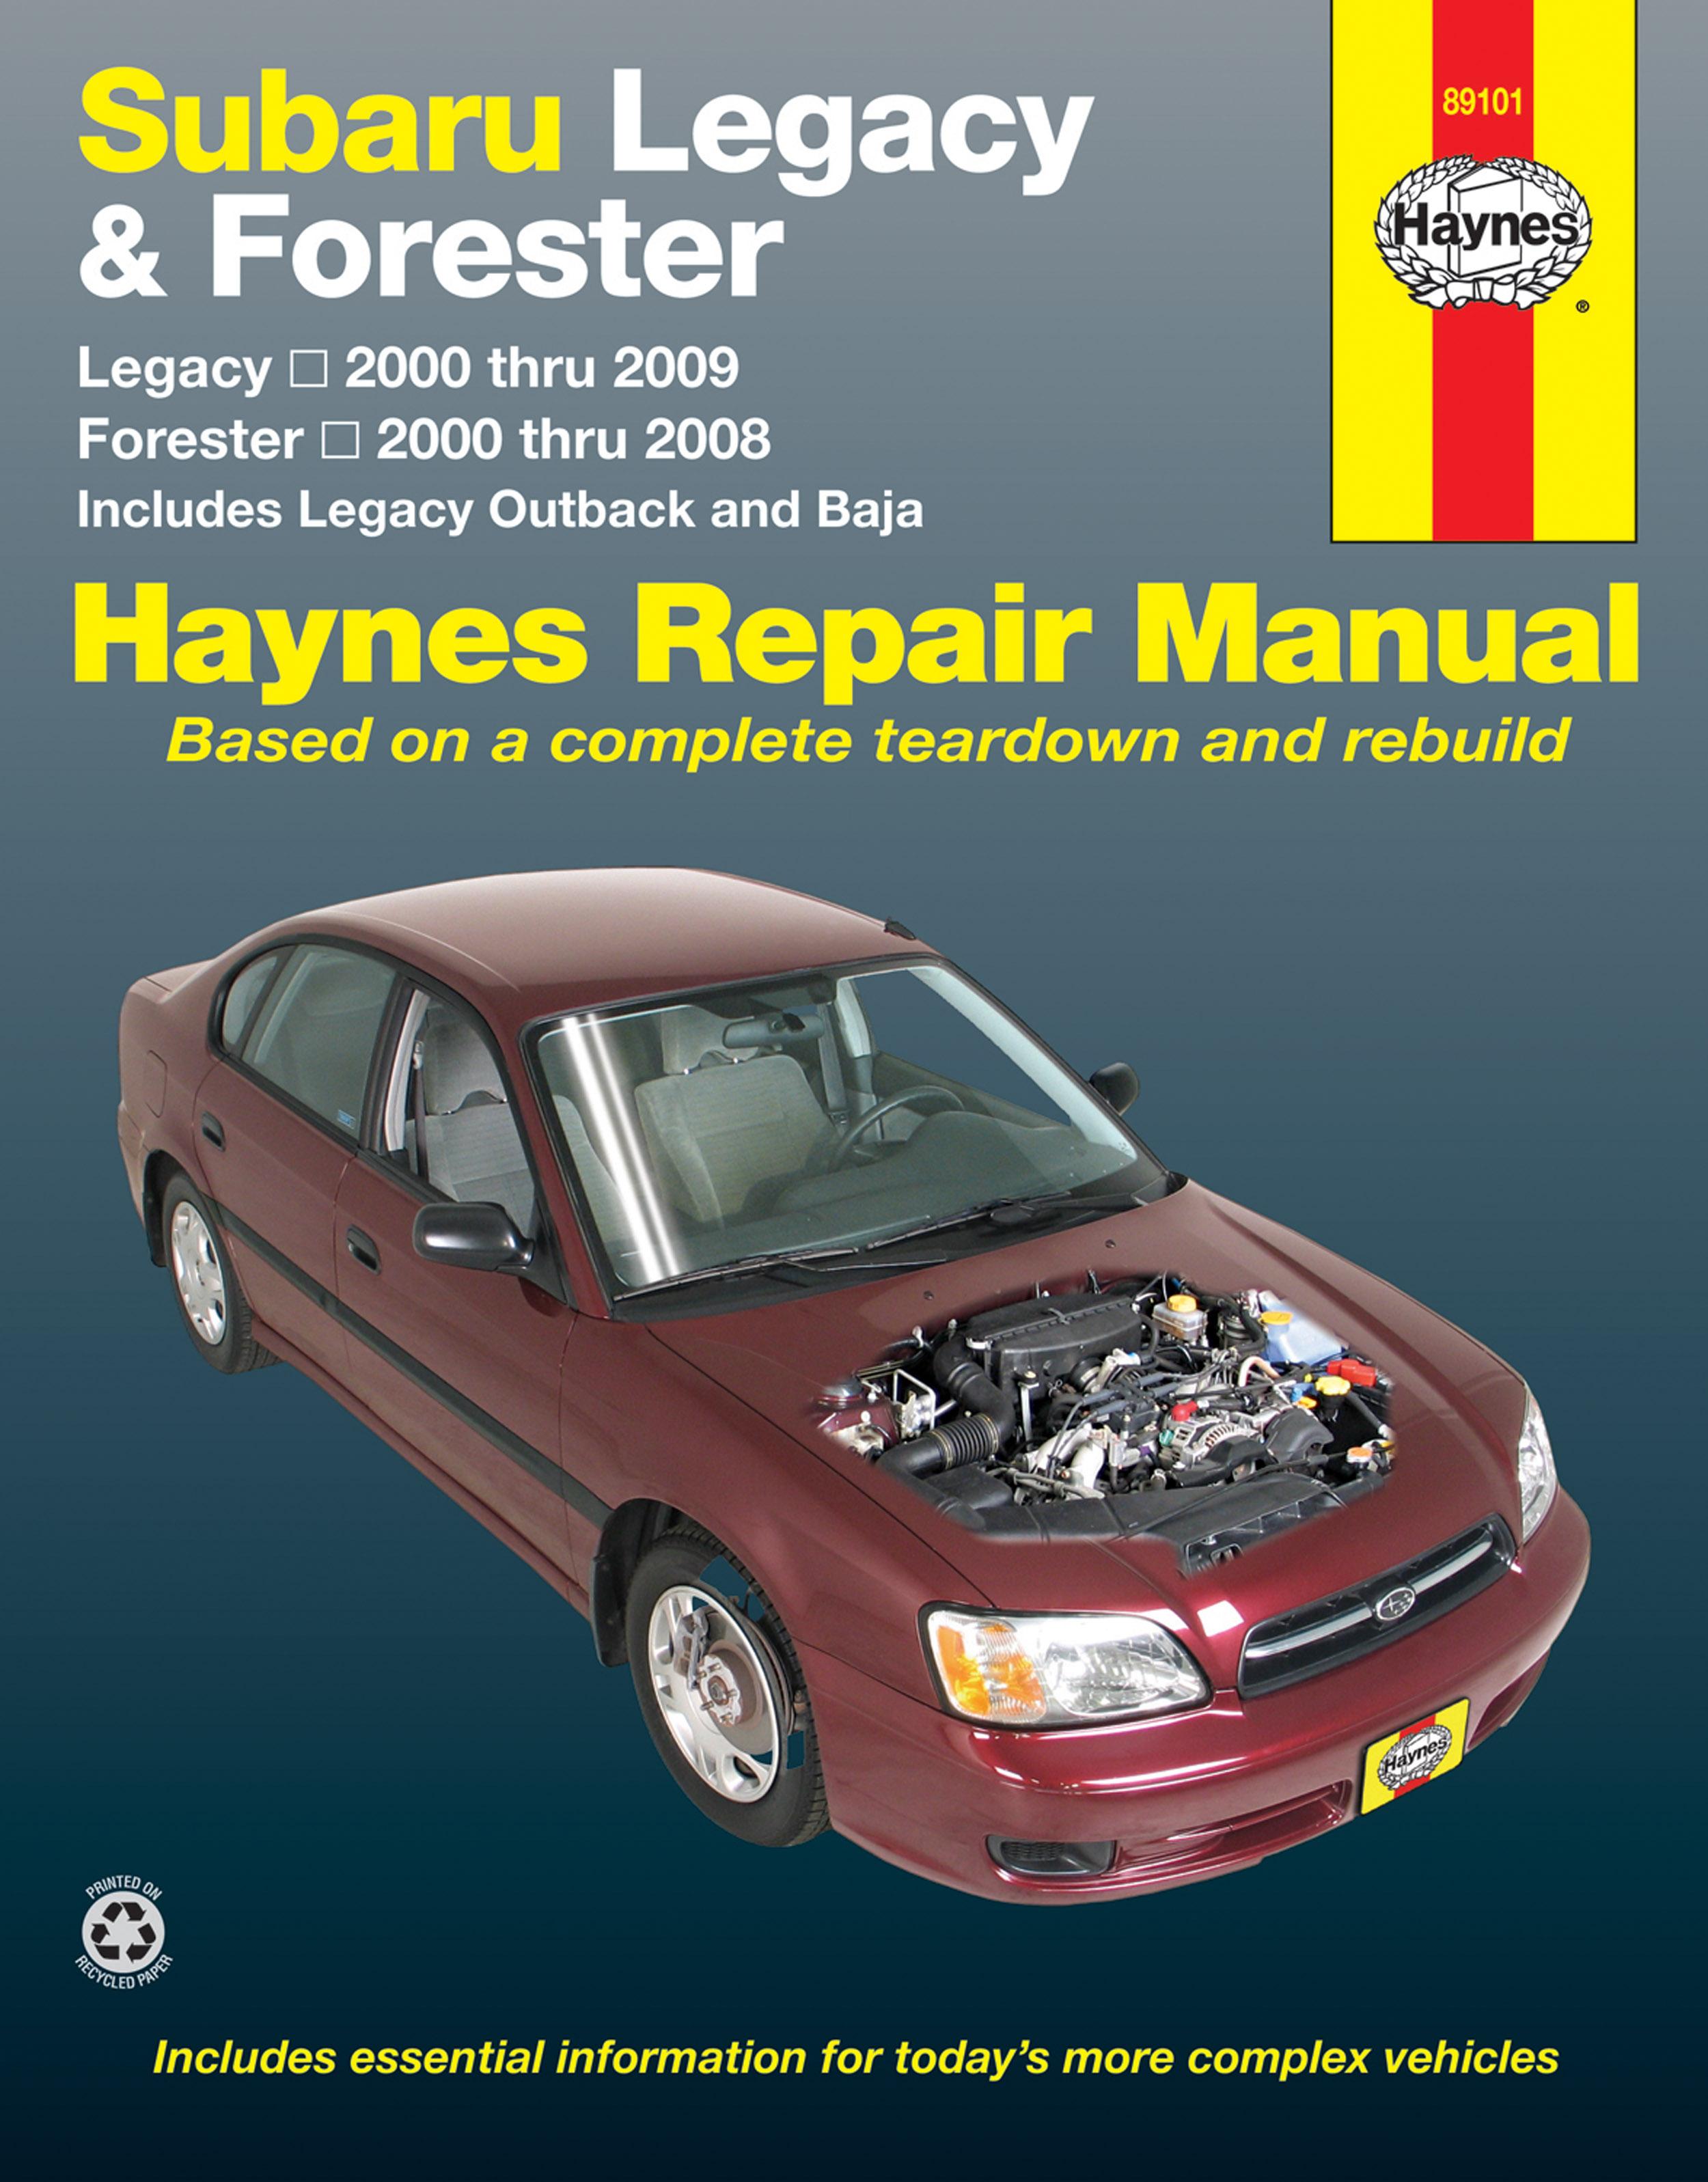 2003 Subaru Forester Shop Manual Pdf